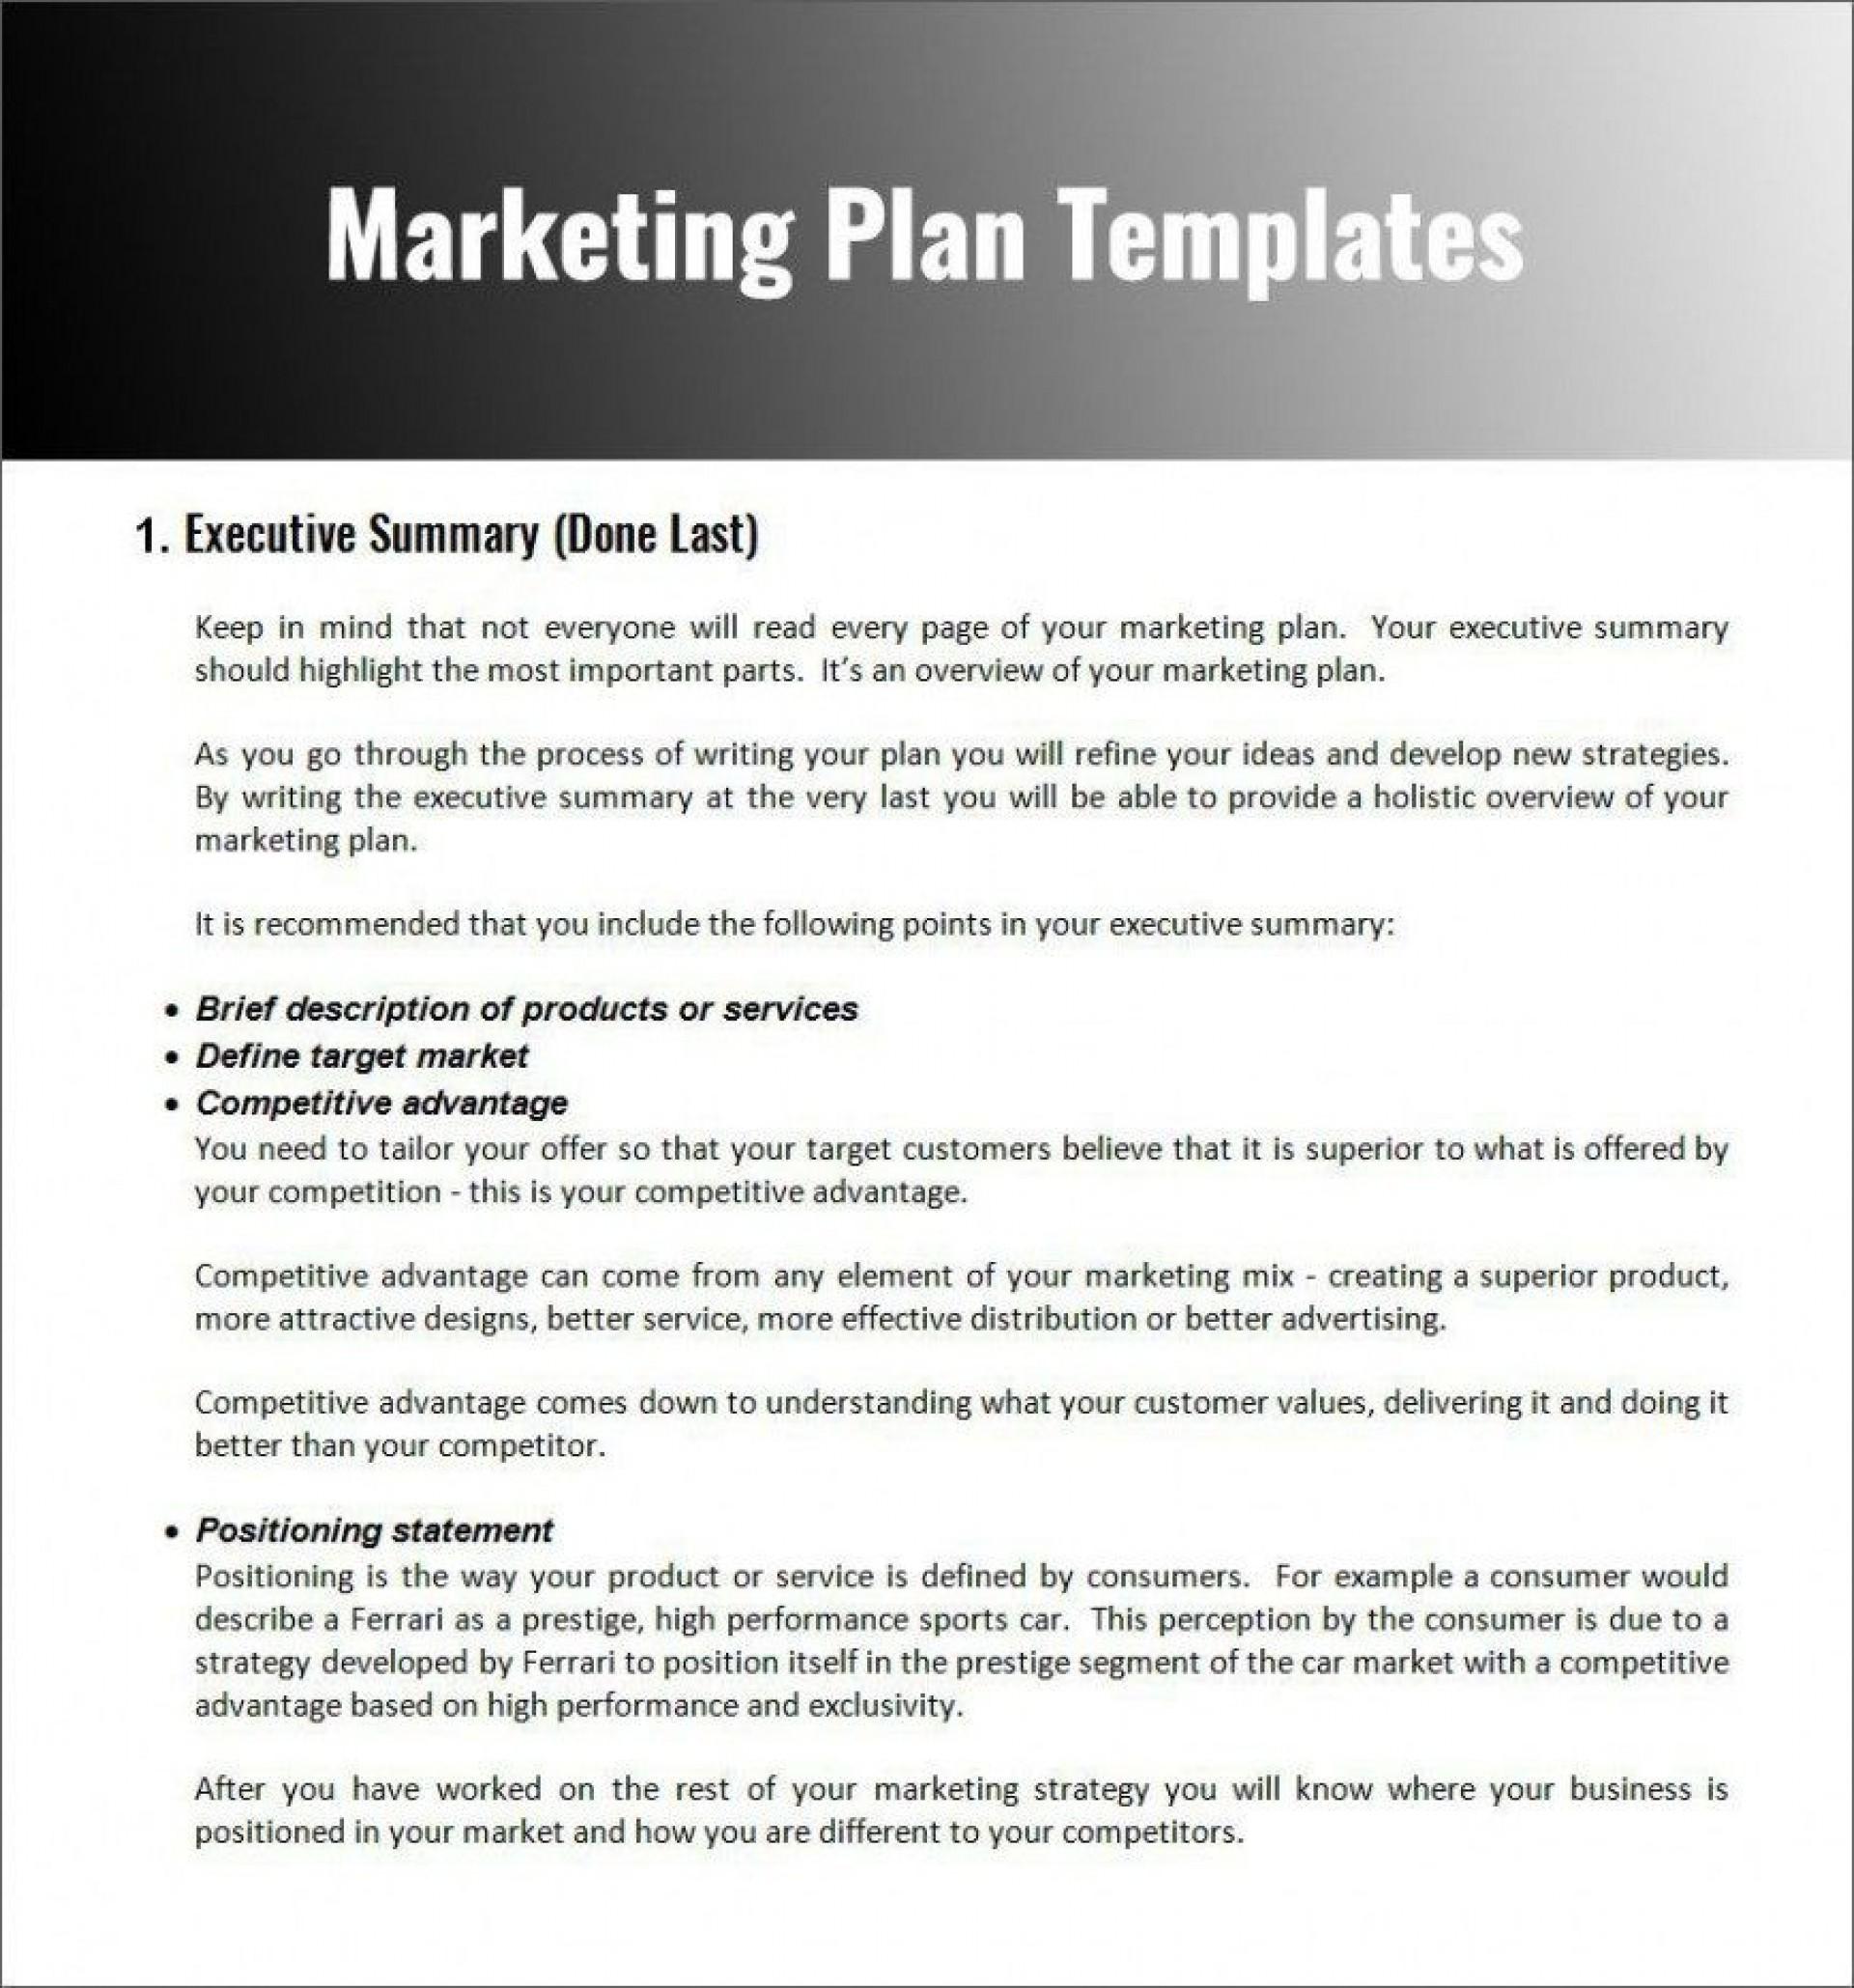 007 Impressive Digital Marketing Plan Template Word Idea 1920